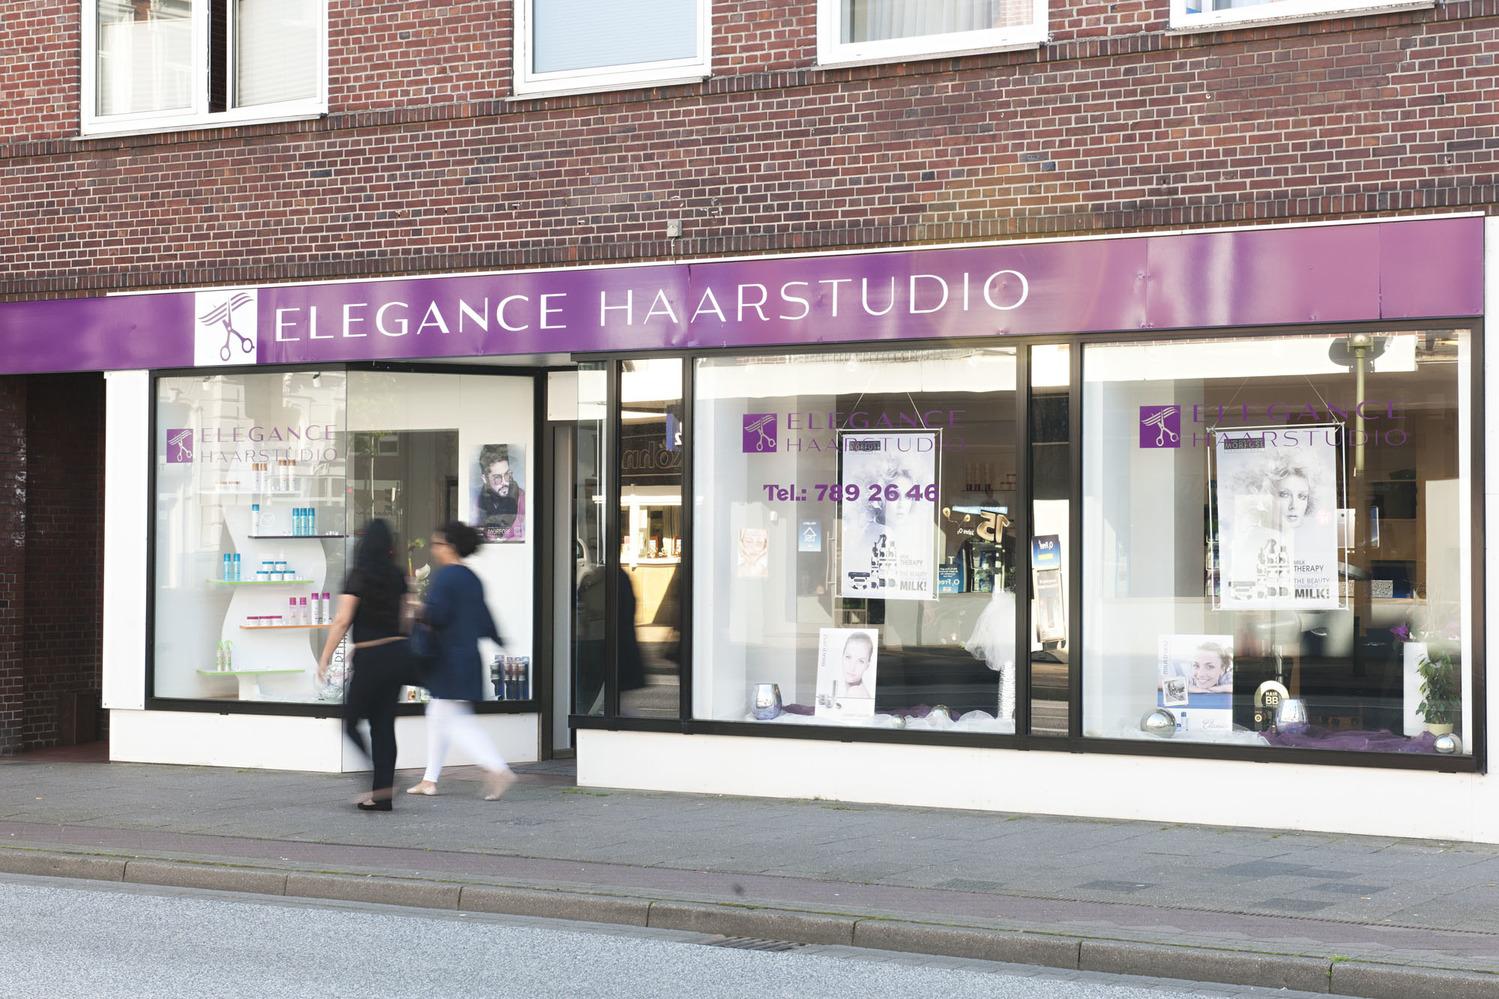 Elegance Haarstudio · Haarstyling, Haarpflege · City ElmshornFriseur Elmshorn